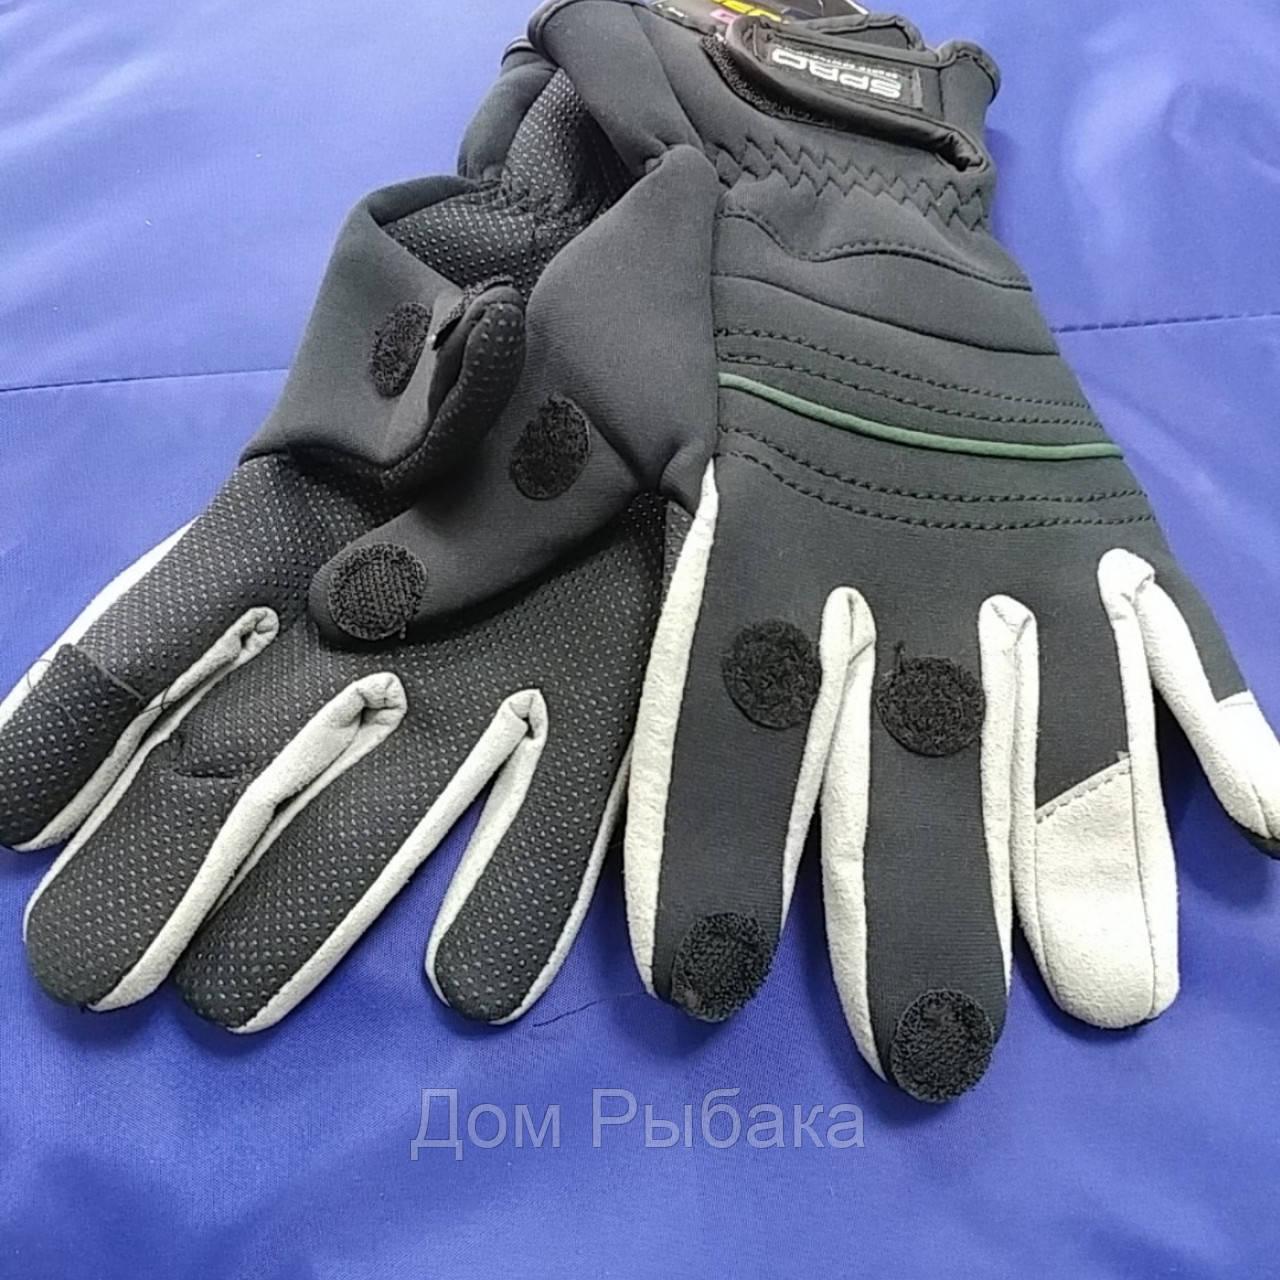 Перчатки неопреновые SPRO Neoprene Gloves L(7085100)